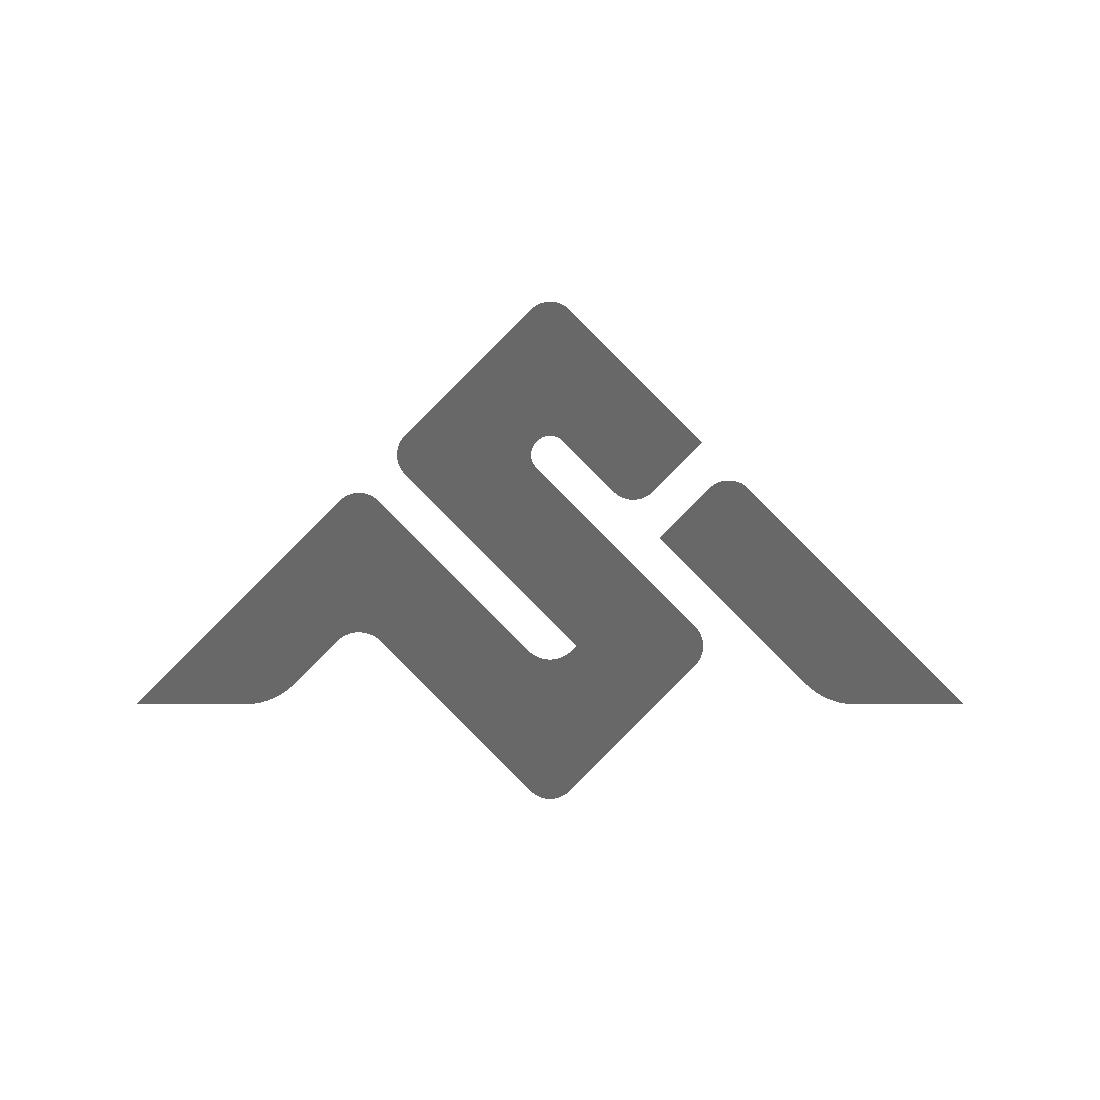 kahuna longboard drop deck 43 39 39 bamboo kaufen longboard in der schweiz sportmania. Black Bedroom Furniture Sets. Home Design Ideas